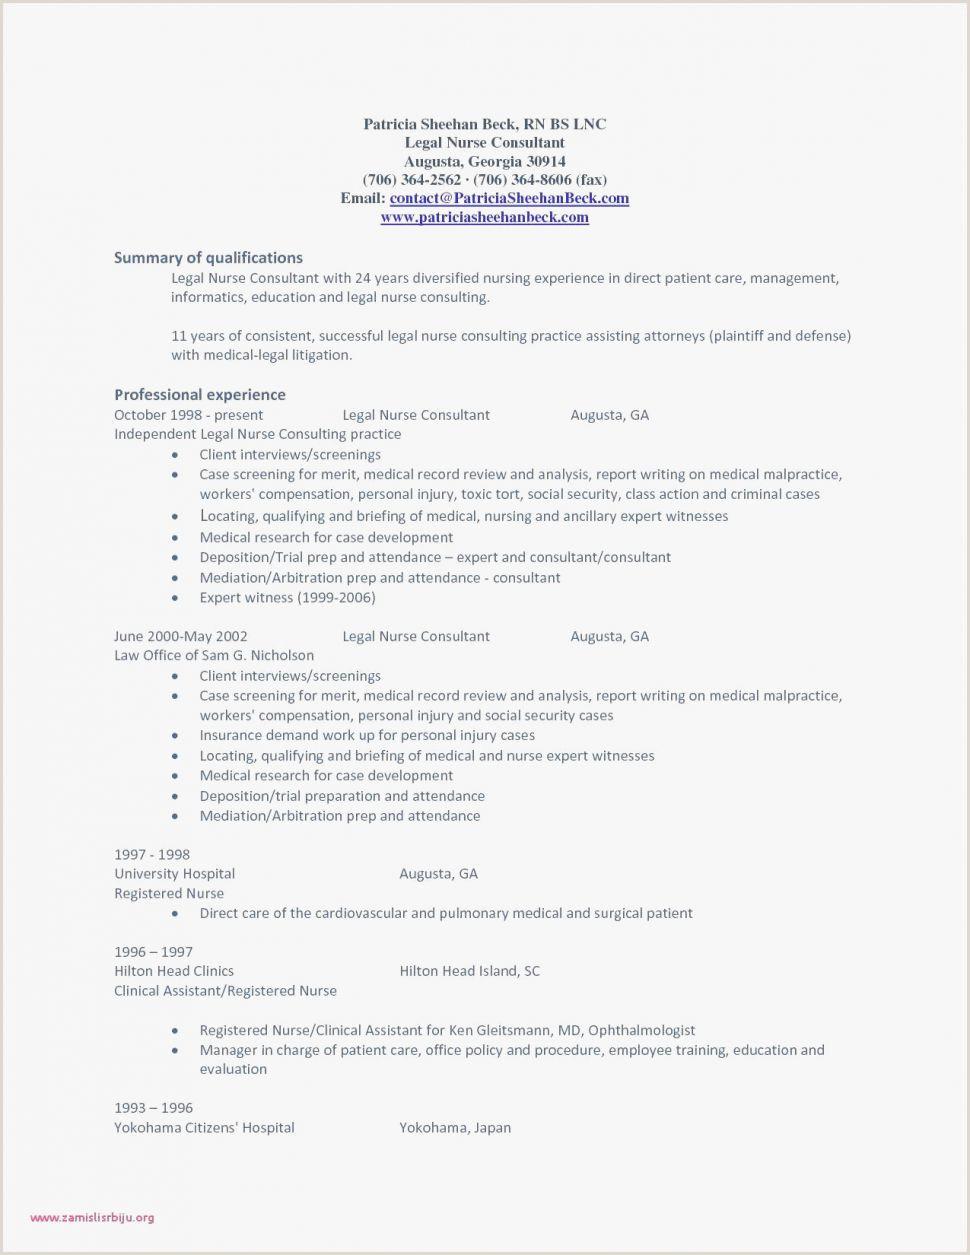 Registered Nurse Resume Summary Hairstyles Resume Templates Nursing 20 Great Nurse Resume